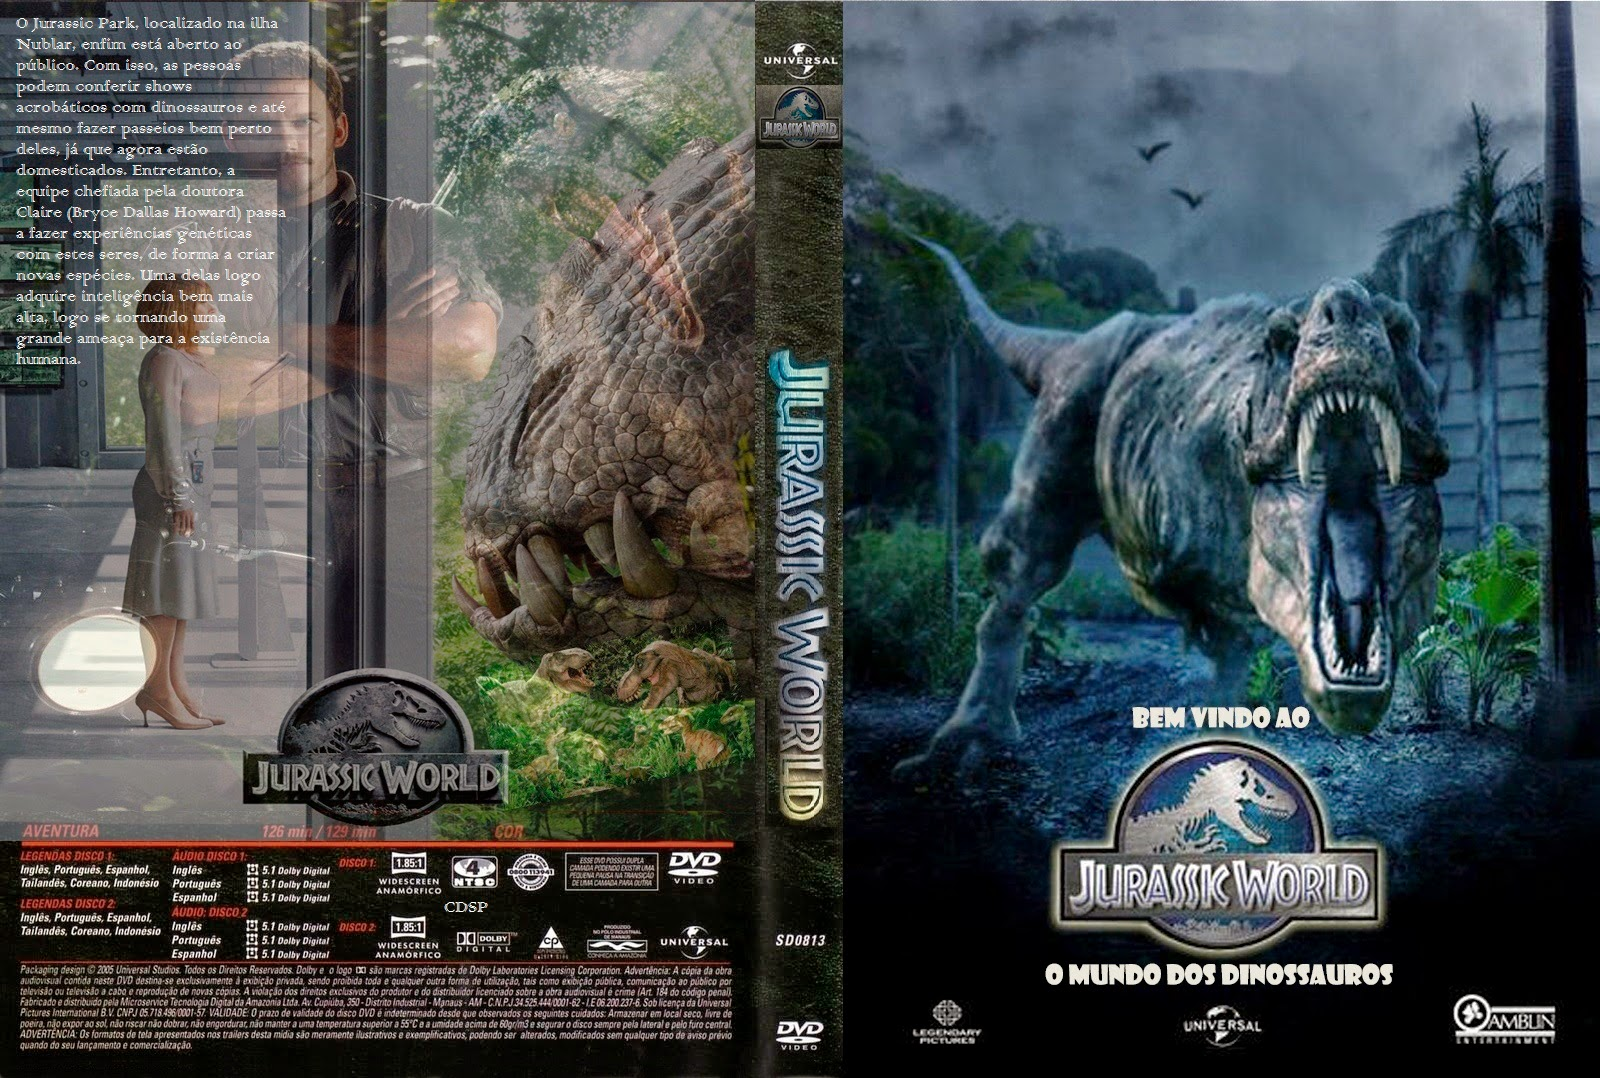 Download Jurassic World O Mundo dos Dinossauros HDRip XviD Dual Áudio Jurassic 2BWorld 2Bcap 2B2